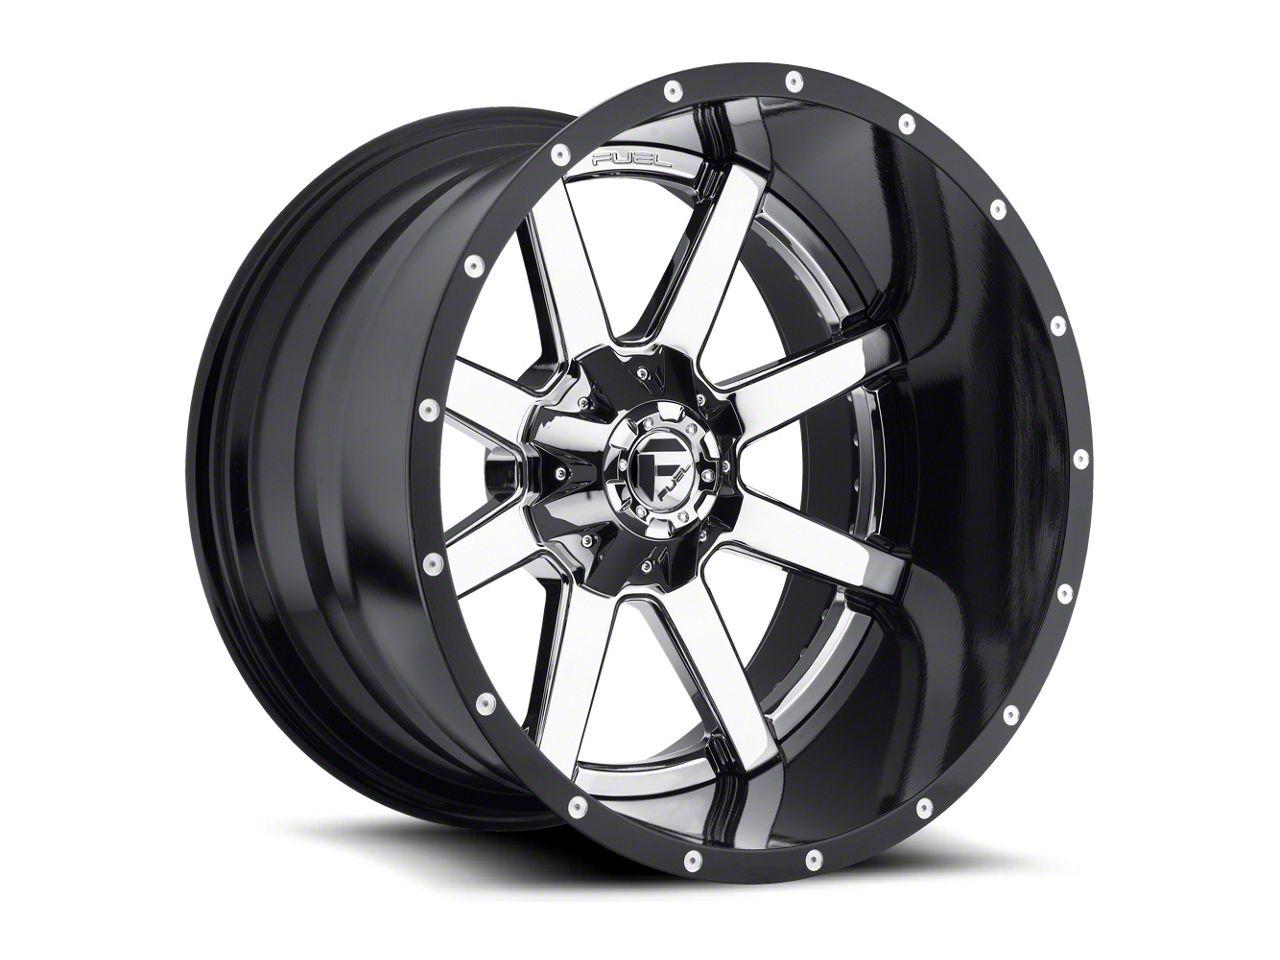 Fuel Wheels Maverick 2-Piece Chrome 5-Lug Wheel - 20x14 (02-18 RAM 1500, Excluding Mega Cab)